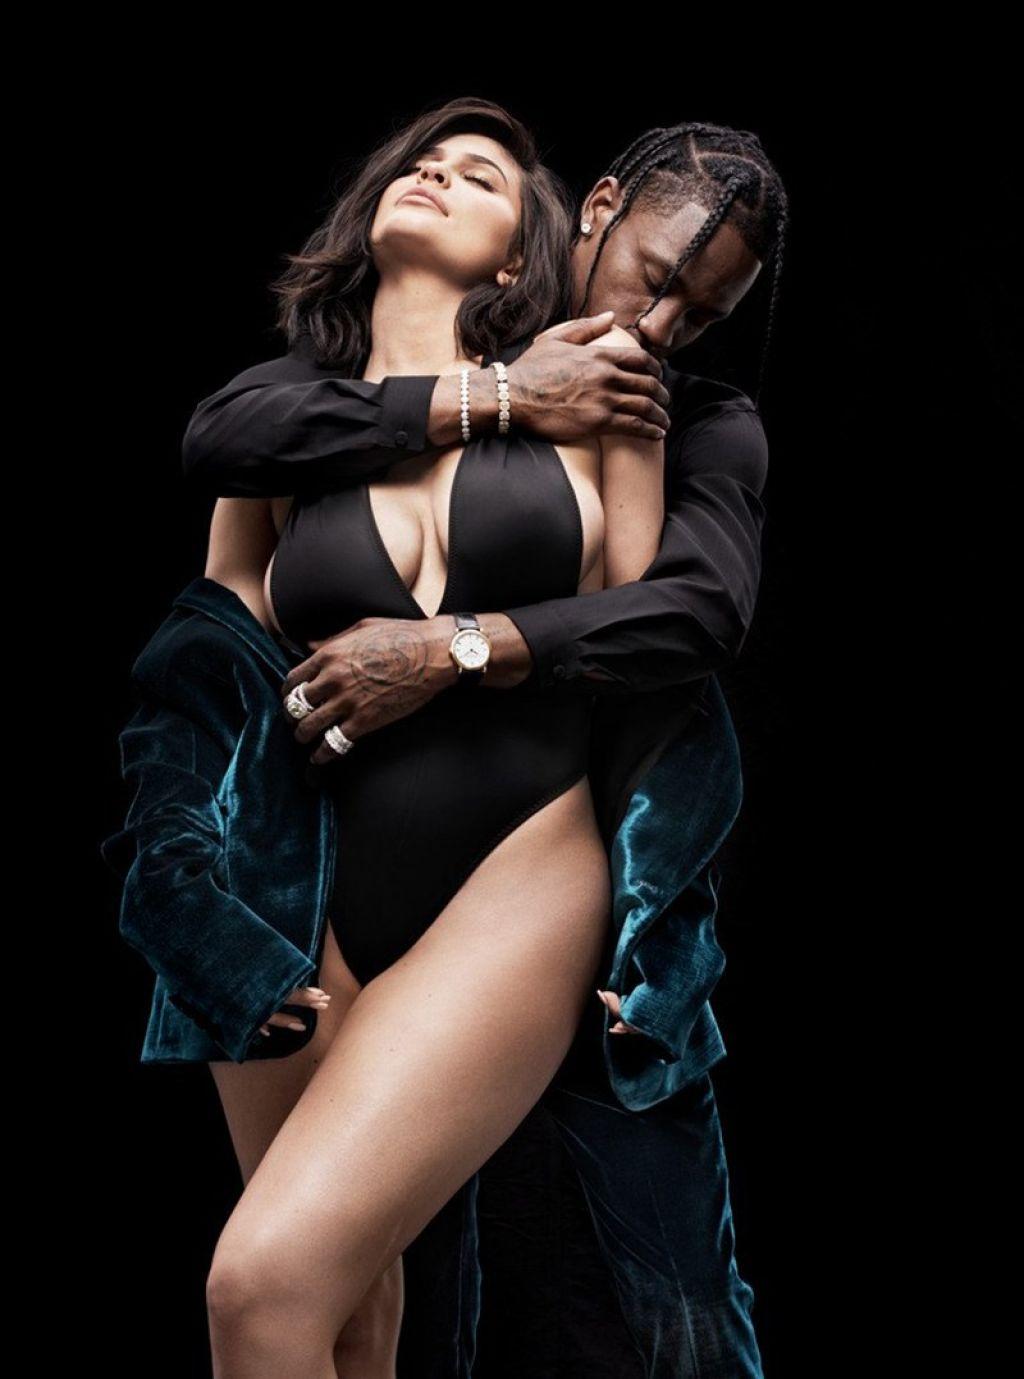 Kylie Jenner And Travis Scott Gq Magazine August 2018